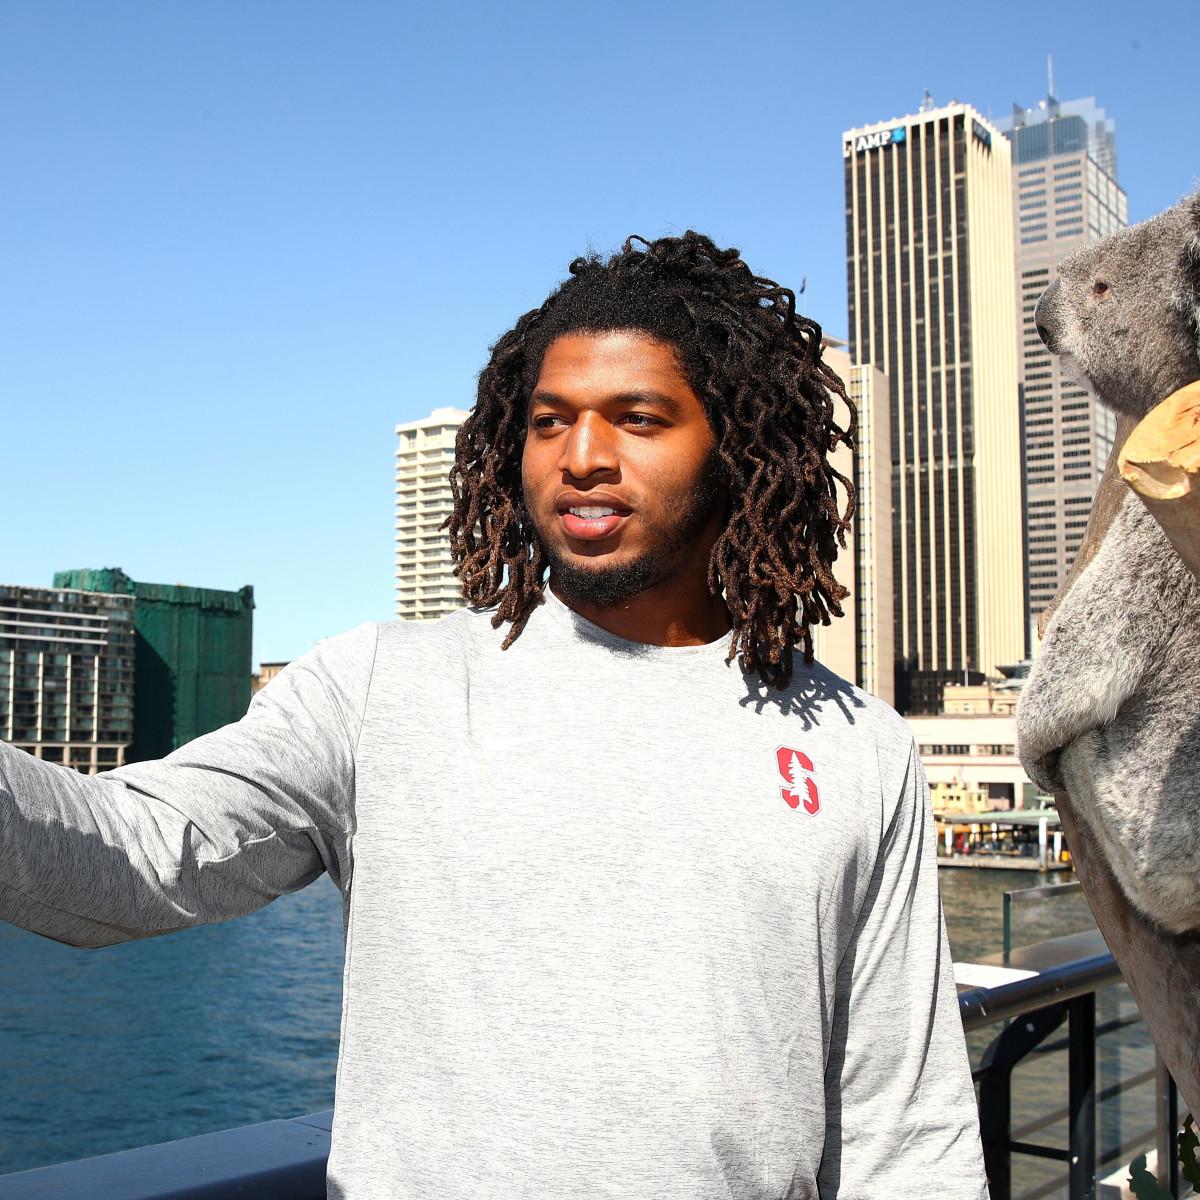 Stanford player Peter Kalambayi and koala in Sydney Australia